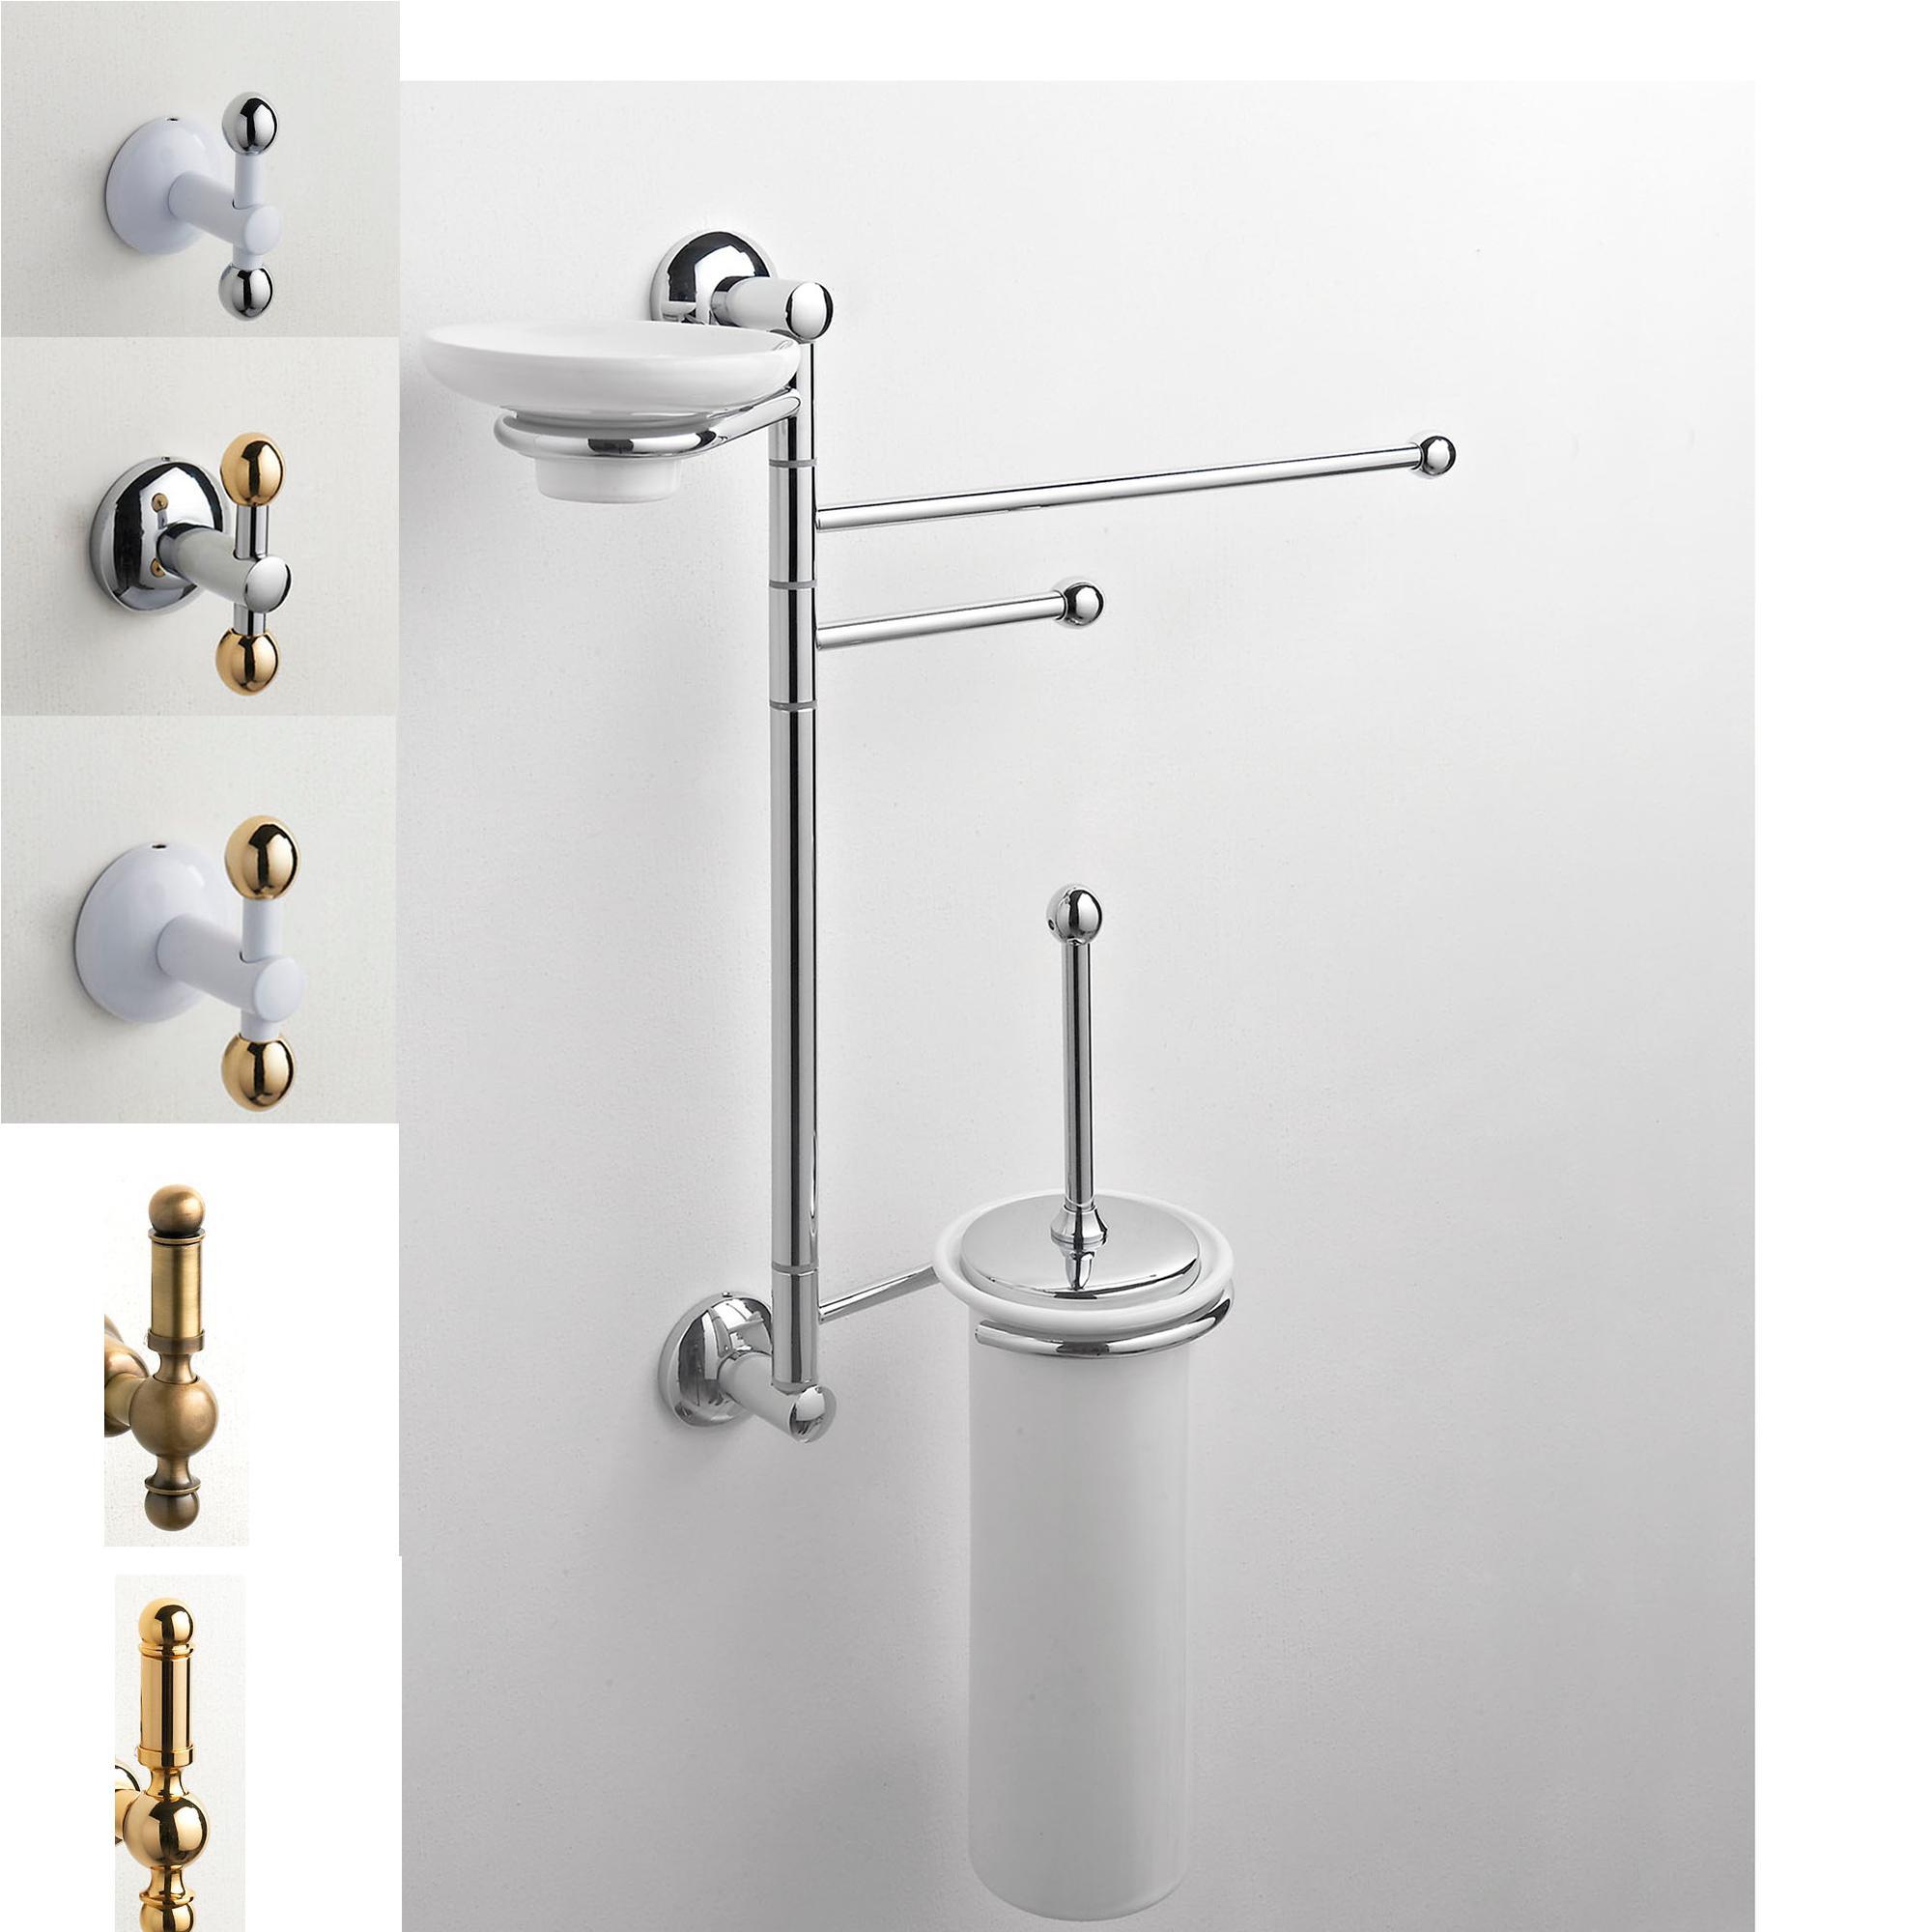 Asta attrezzata wc bidet zacinto 44x14xh60 cm porta - Porta asciugamani bidet ...